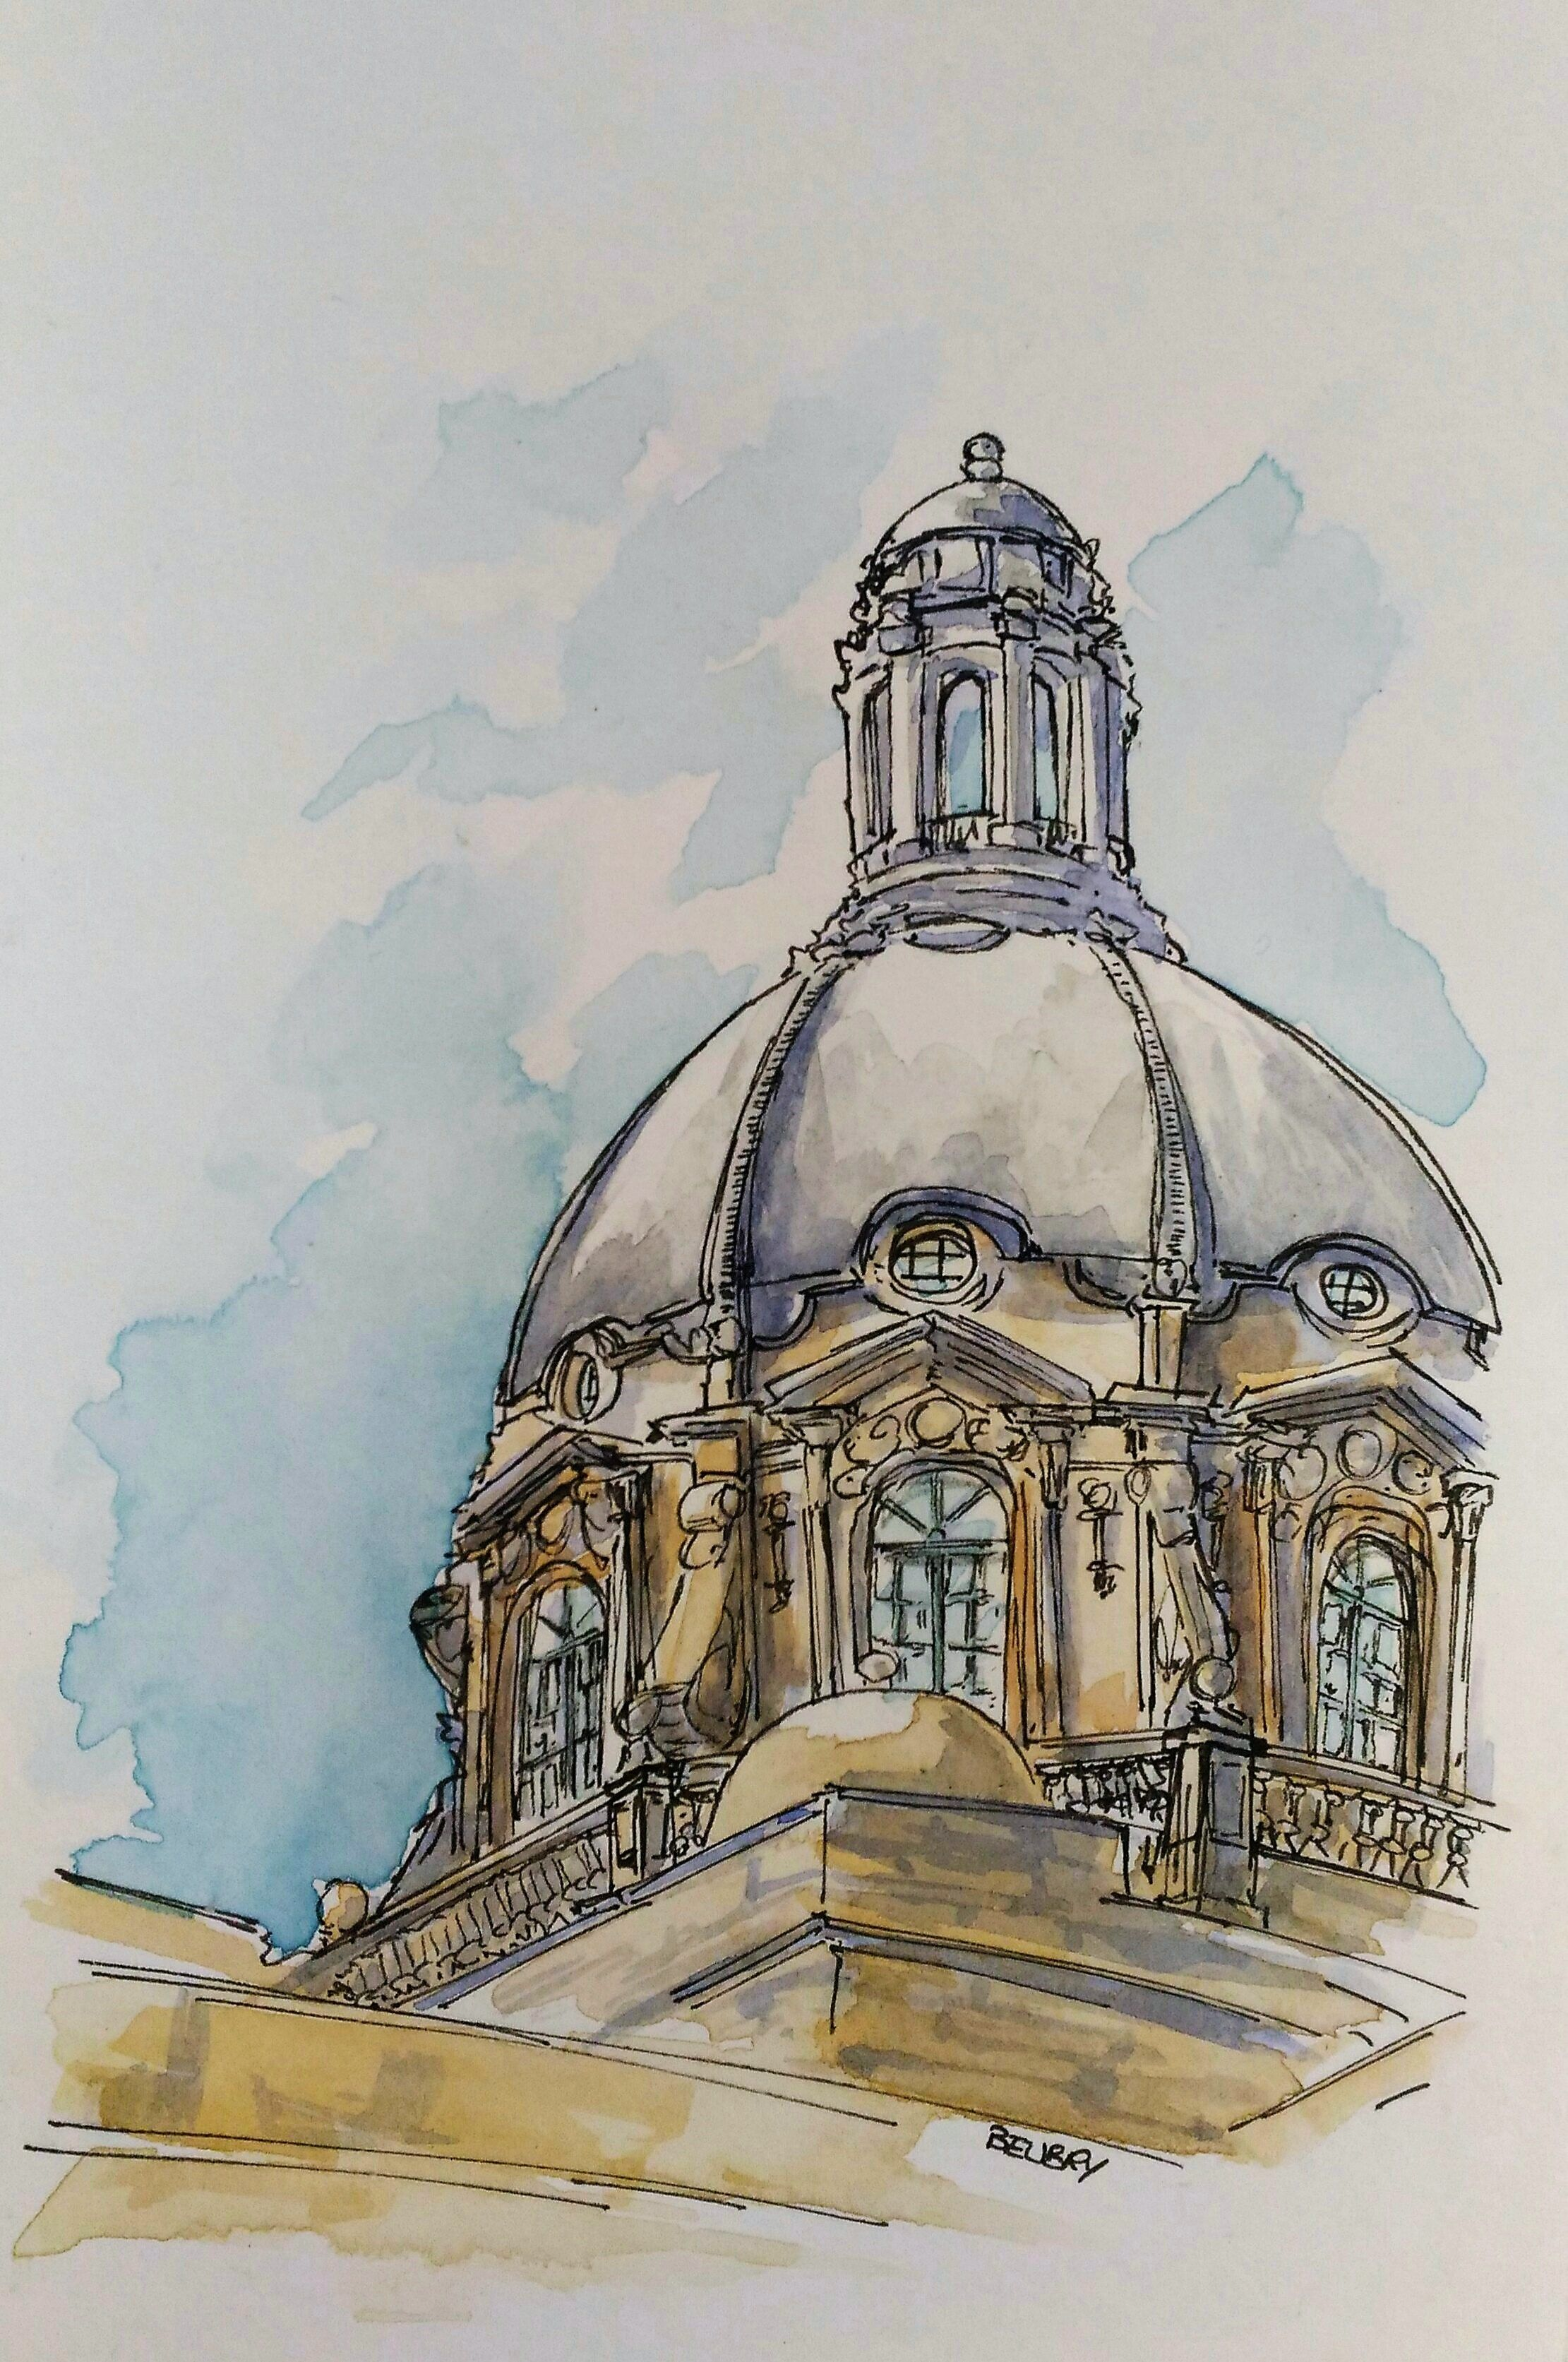 The Legislature Building Urban Sketch Watercolor Painting